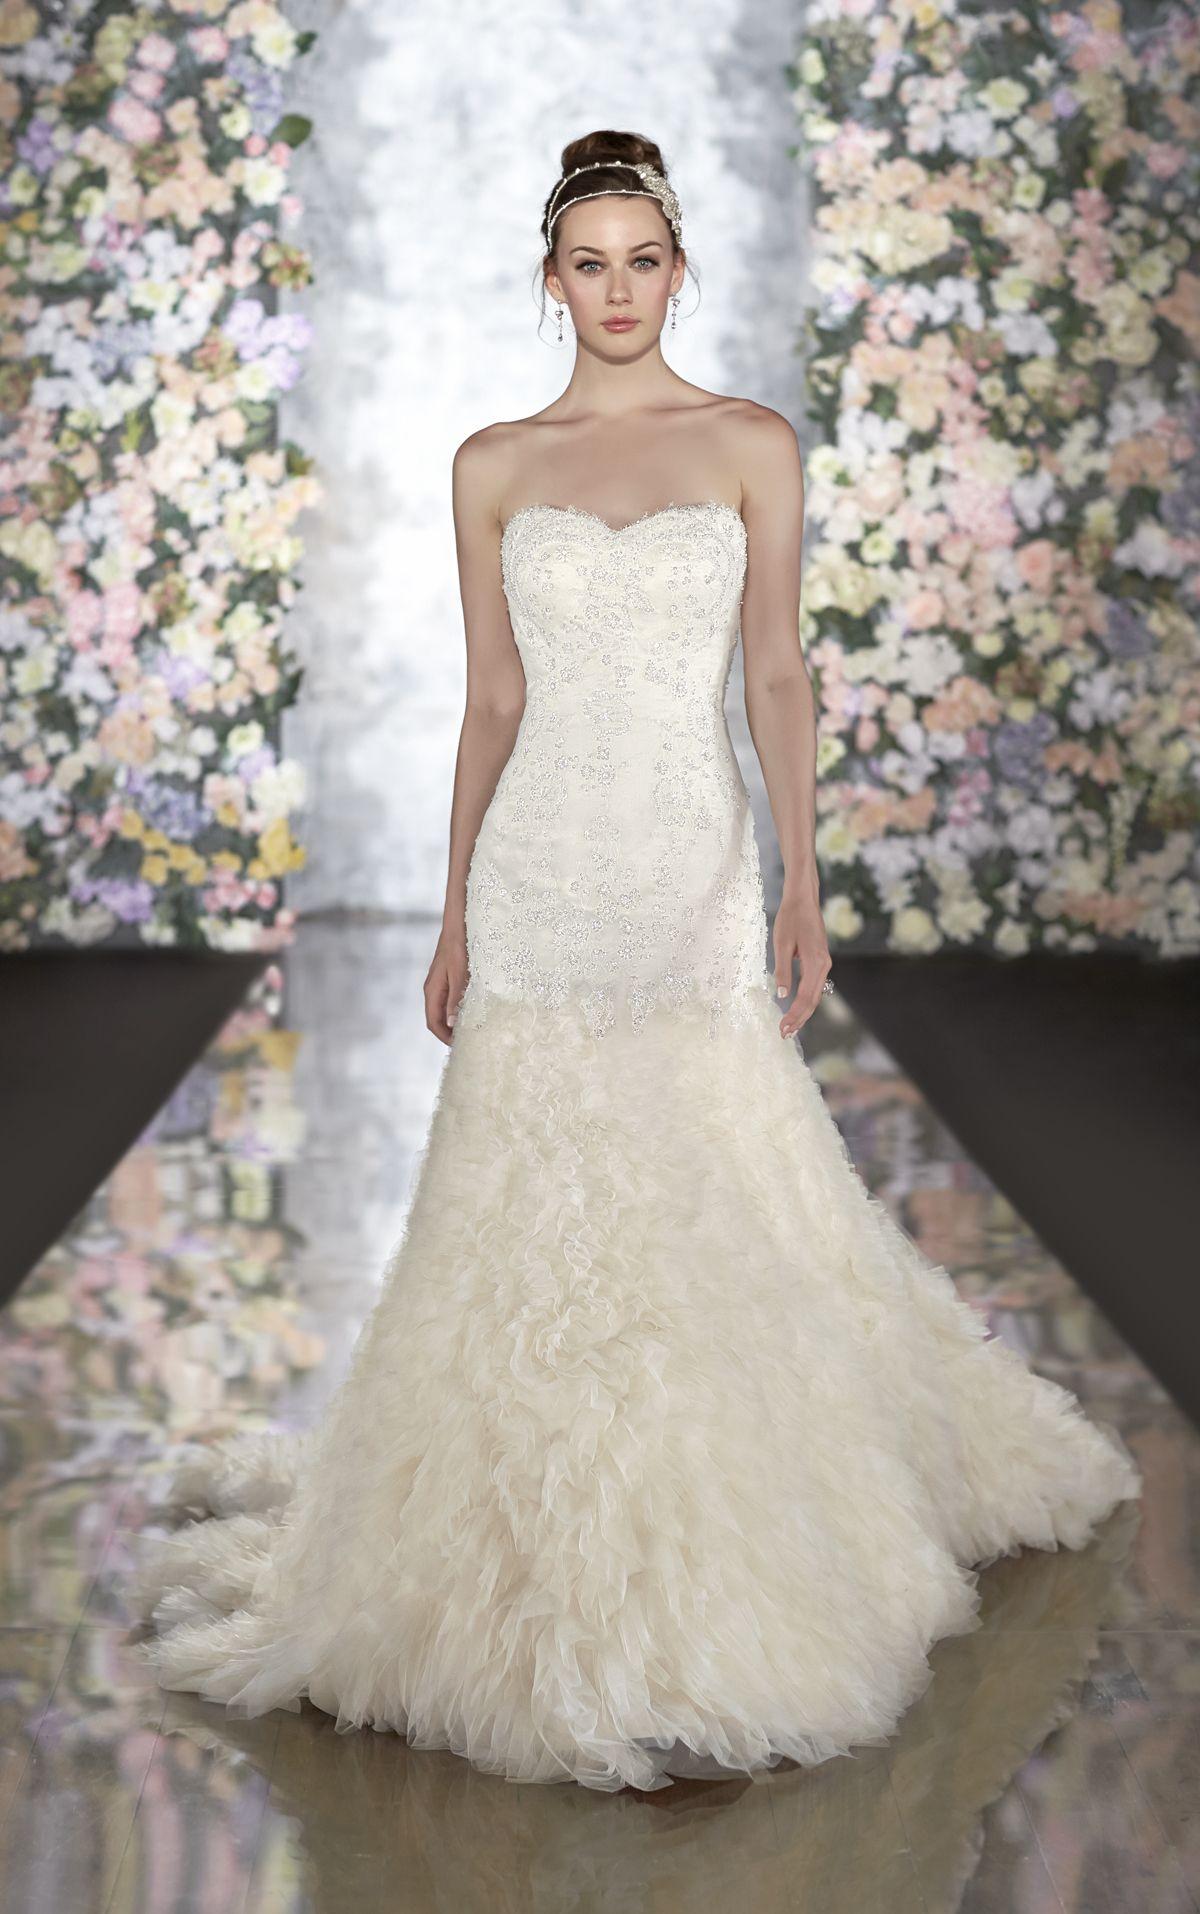 Strapless fitted lace wedding dresses  DMZP by  Wedding Atelier MadamPaloozaEmporium